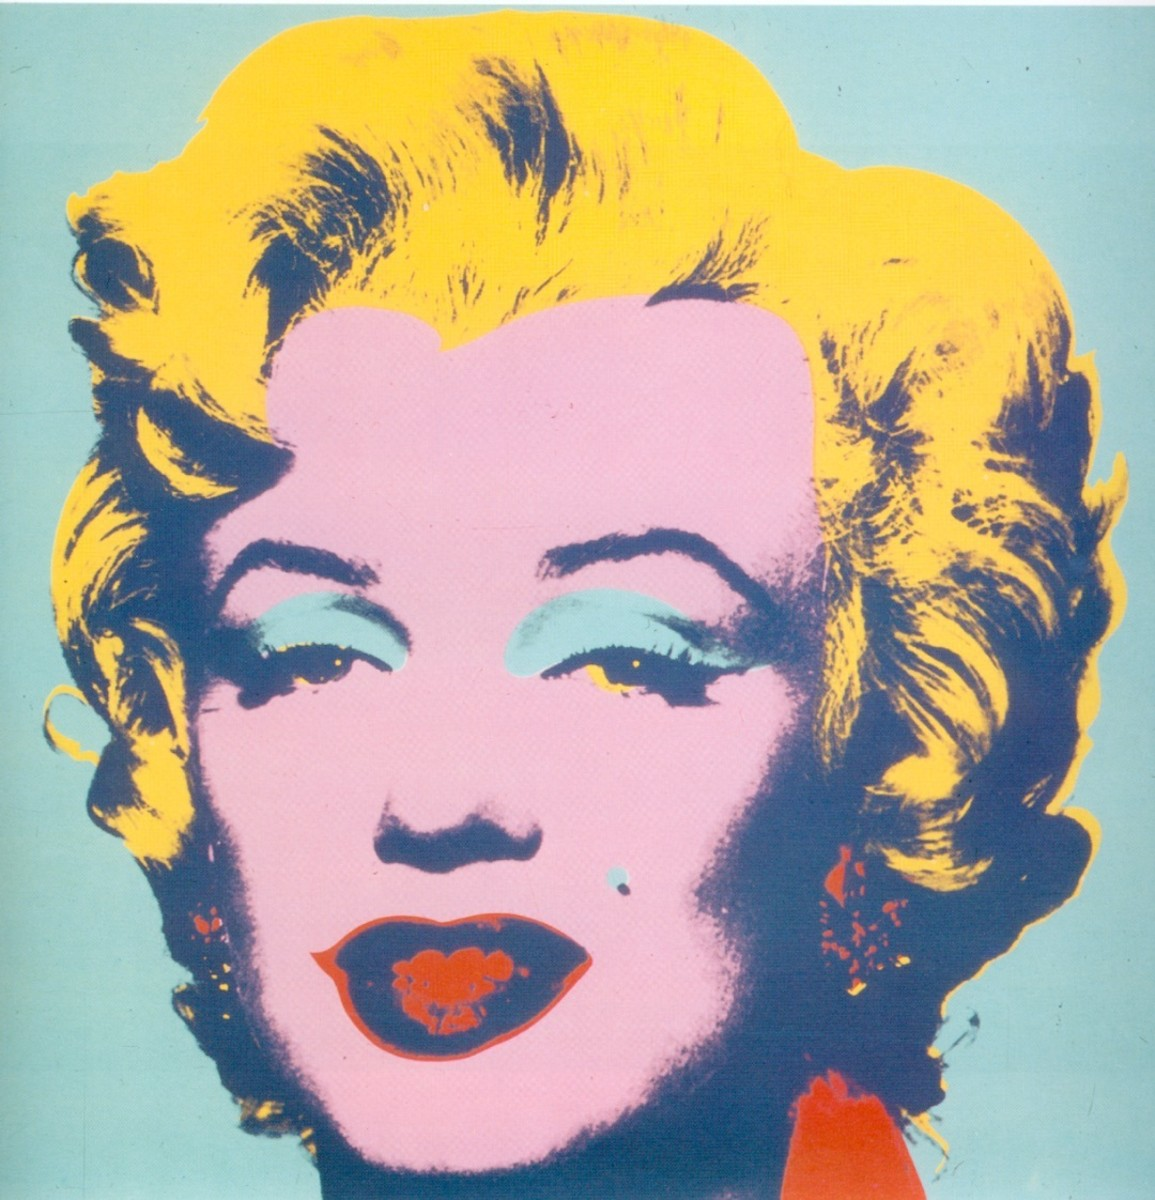 Warhol representation of Marilyn Monroe